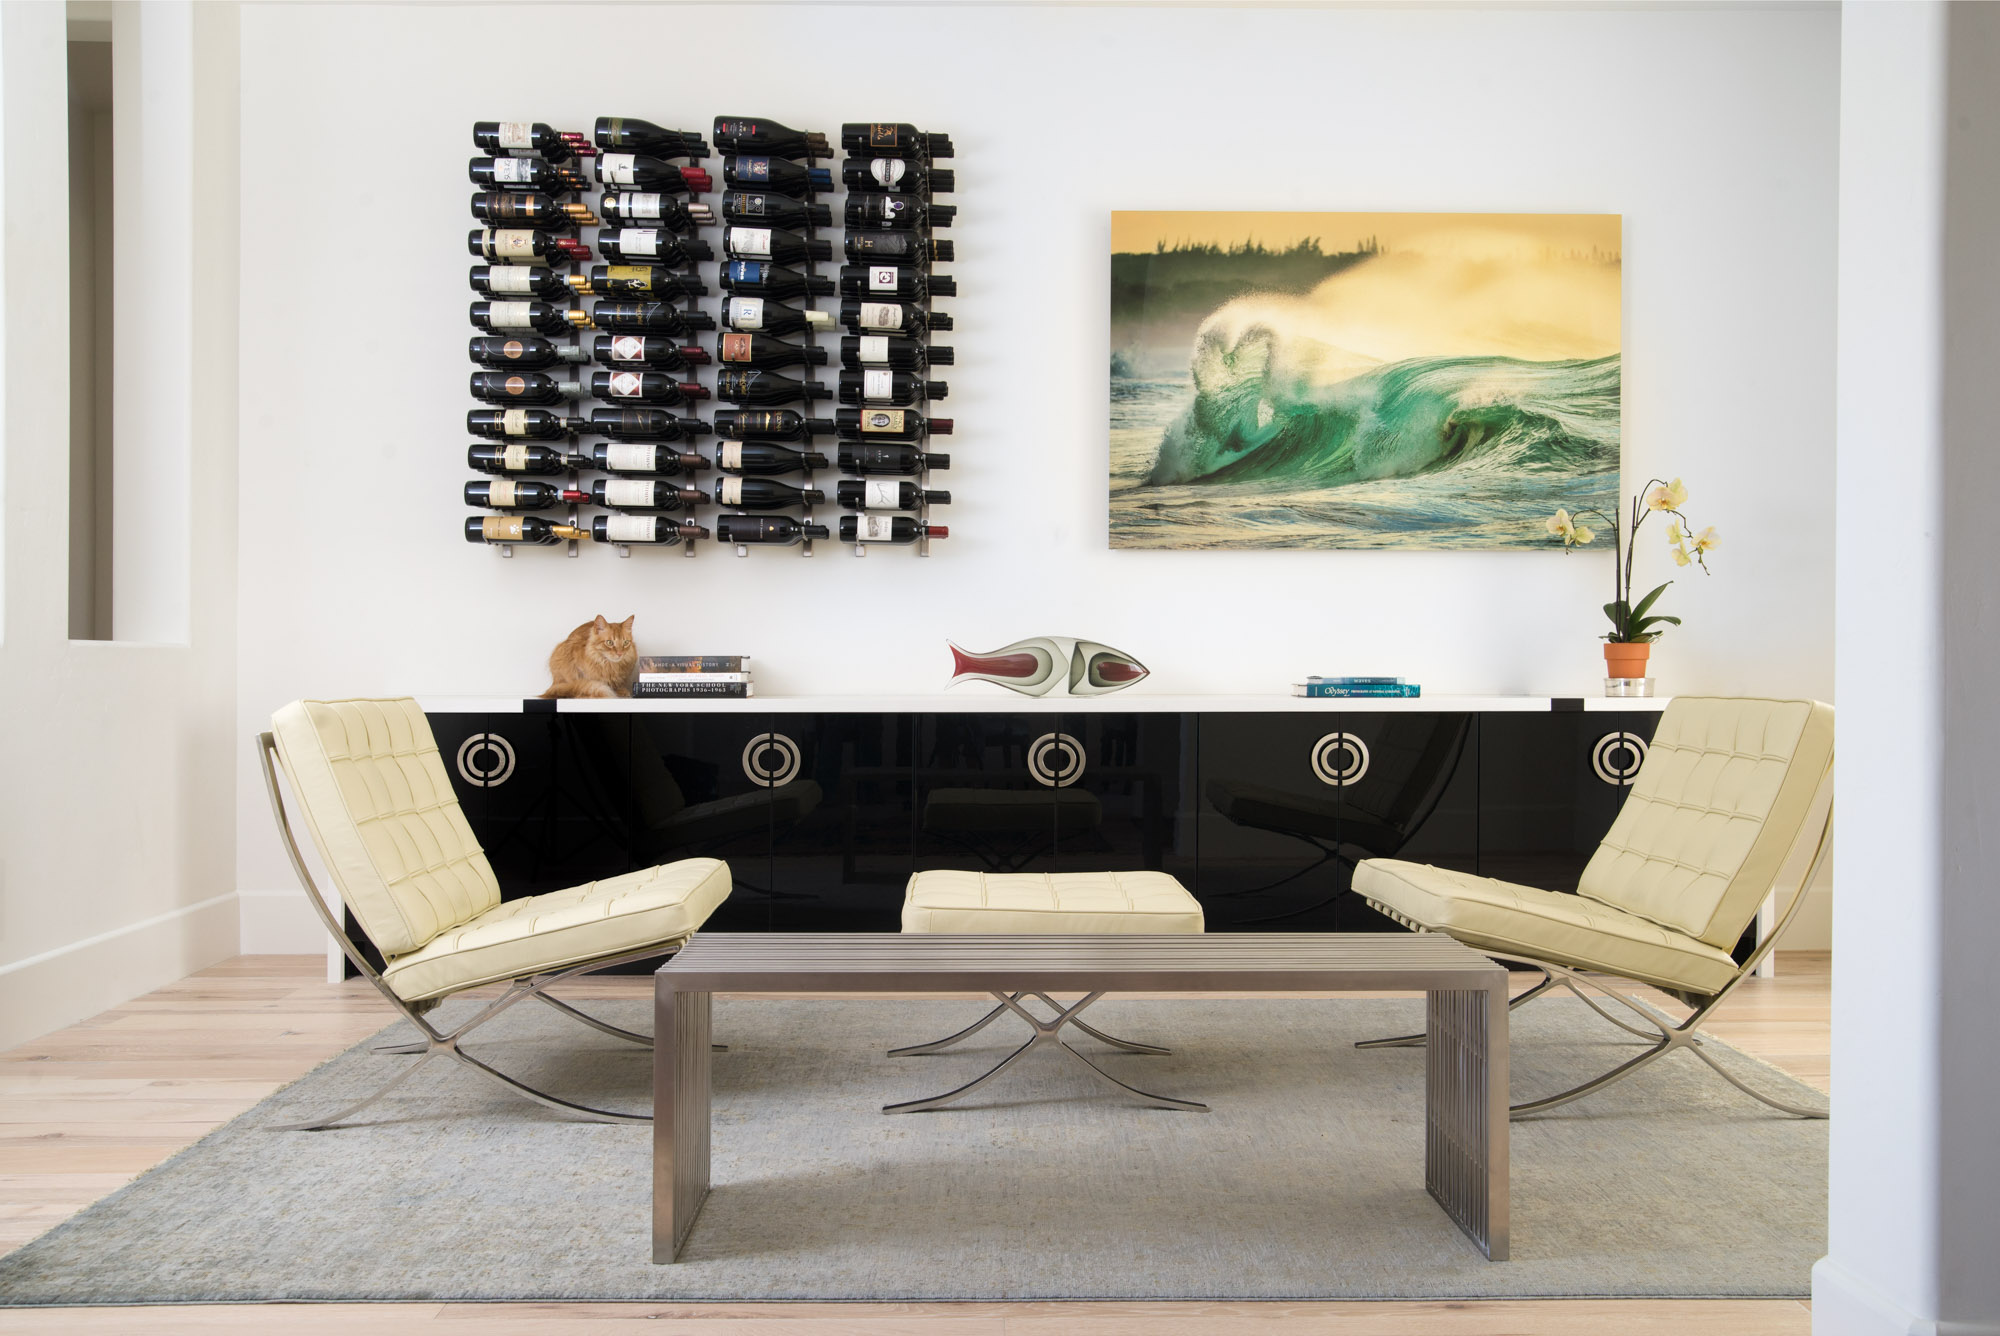 Mount Rose Estates art and furniture selection and interior design - Reno, Nevada - Kovac Design